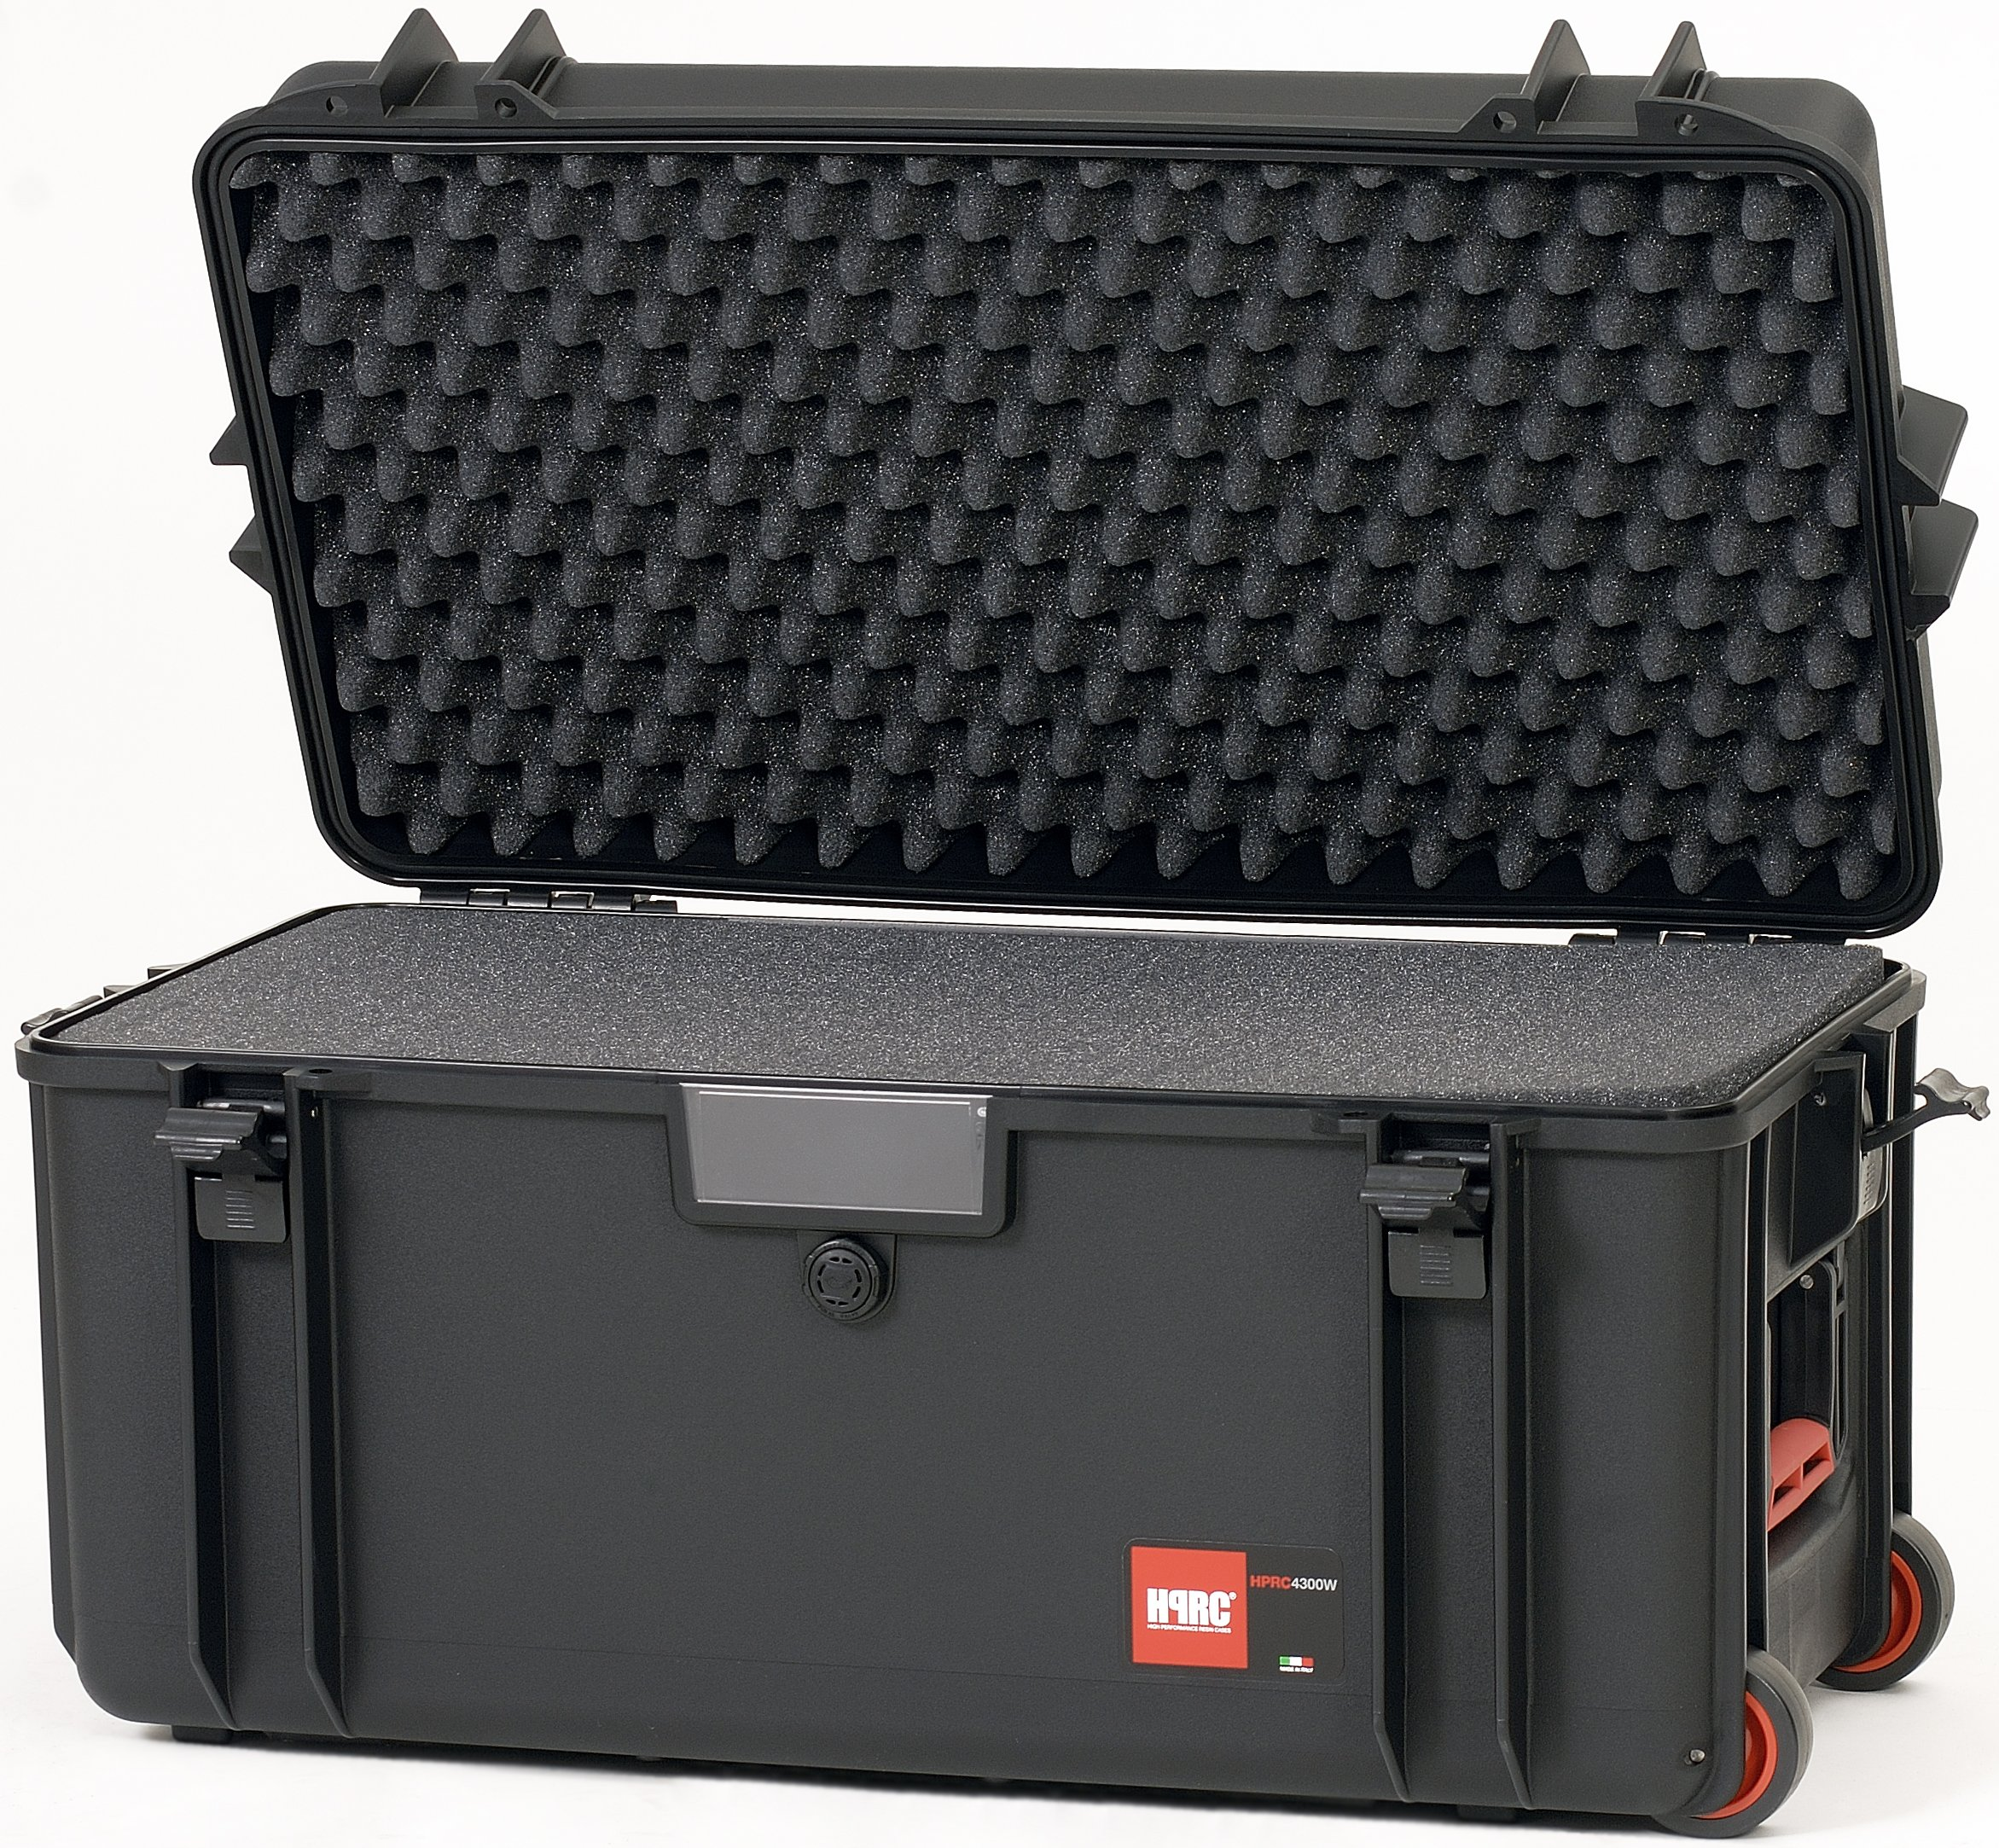 HPRC 4300W Case